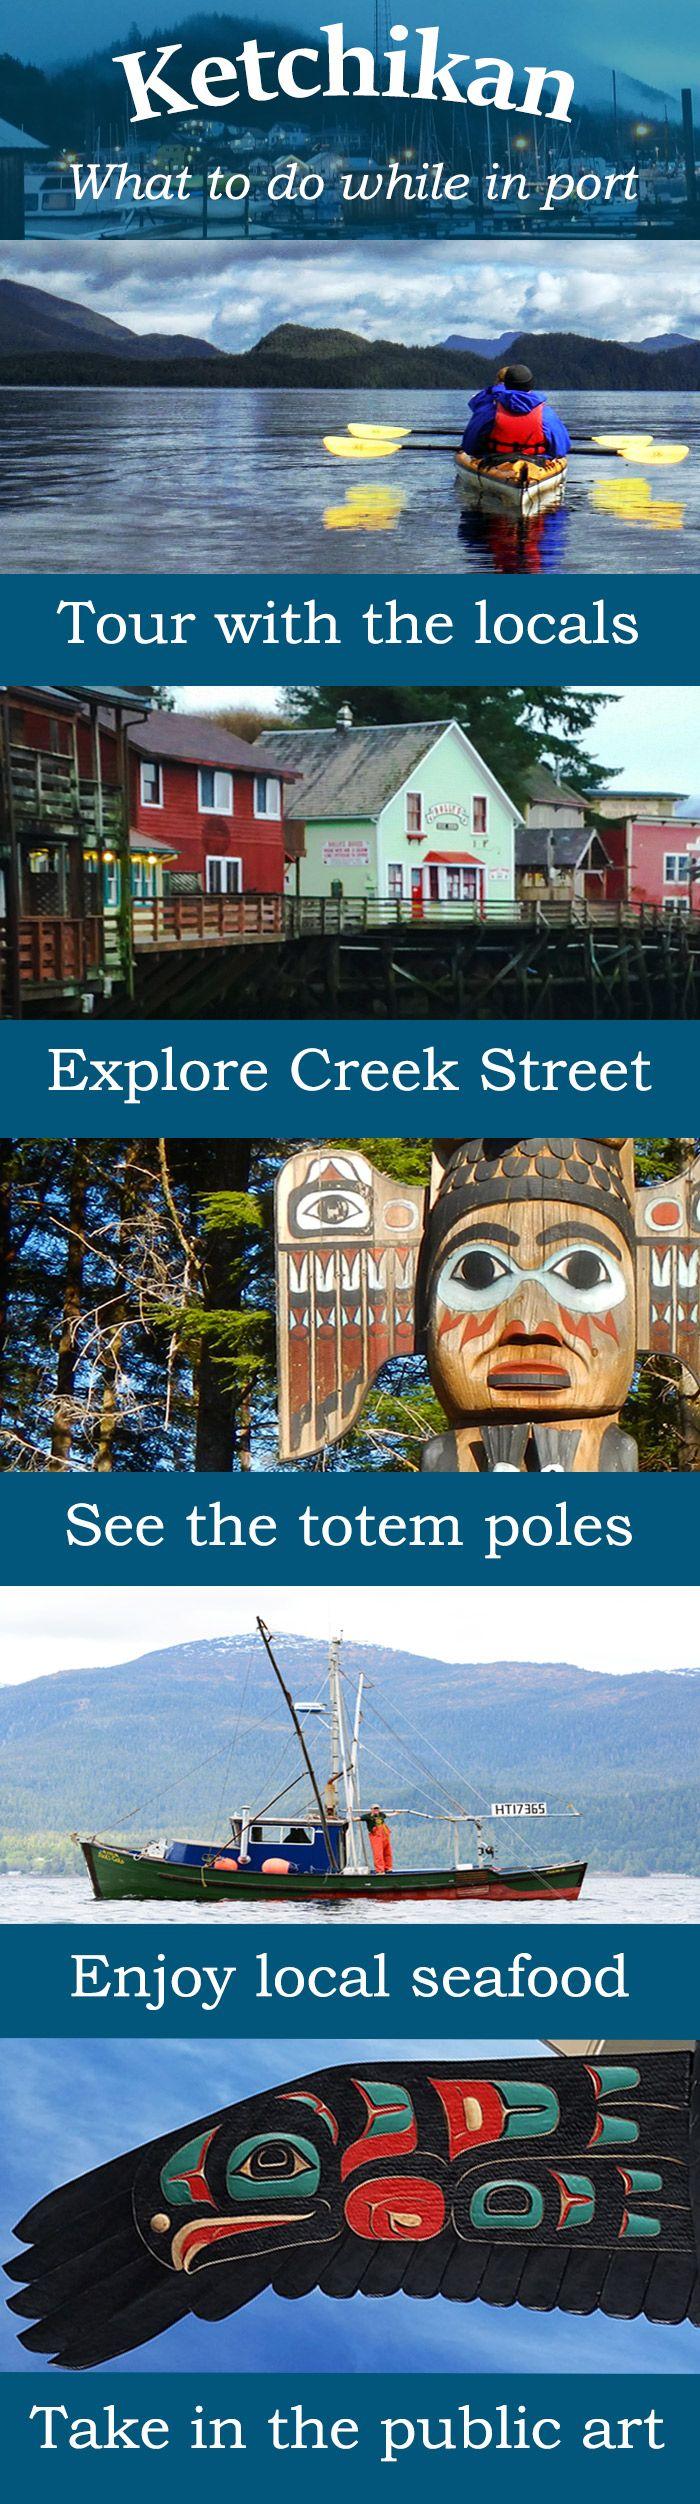 Ketchikan Shore Tours - Ketchikan Tours and Shore Excursions